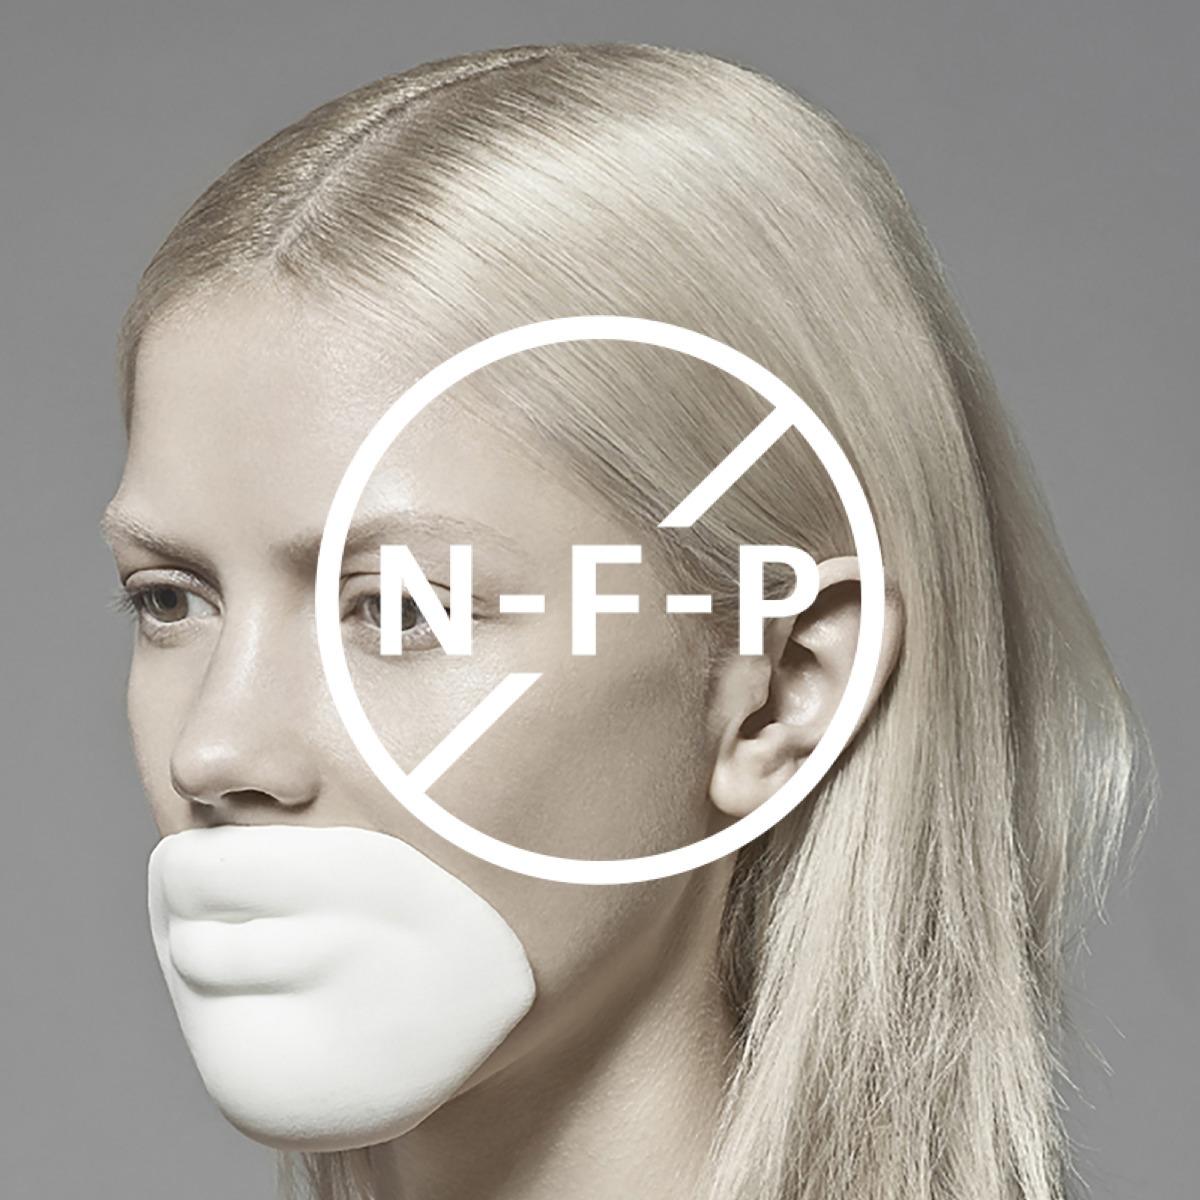 Not For Print Issue 01 – Censorship